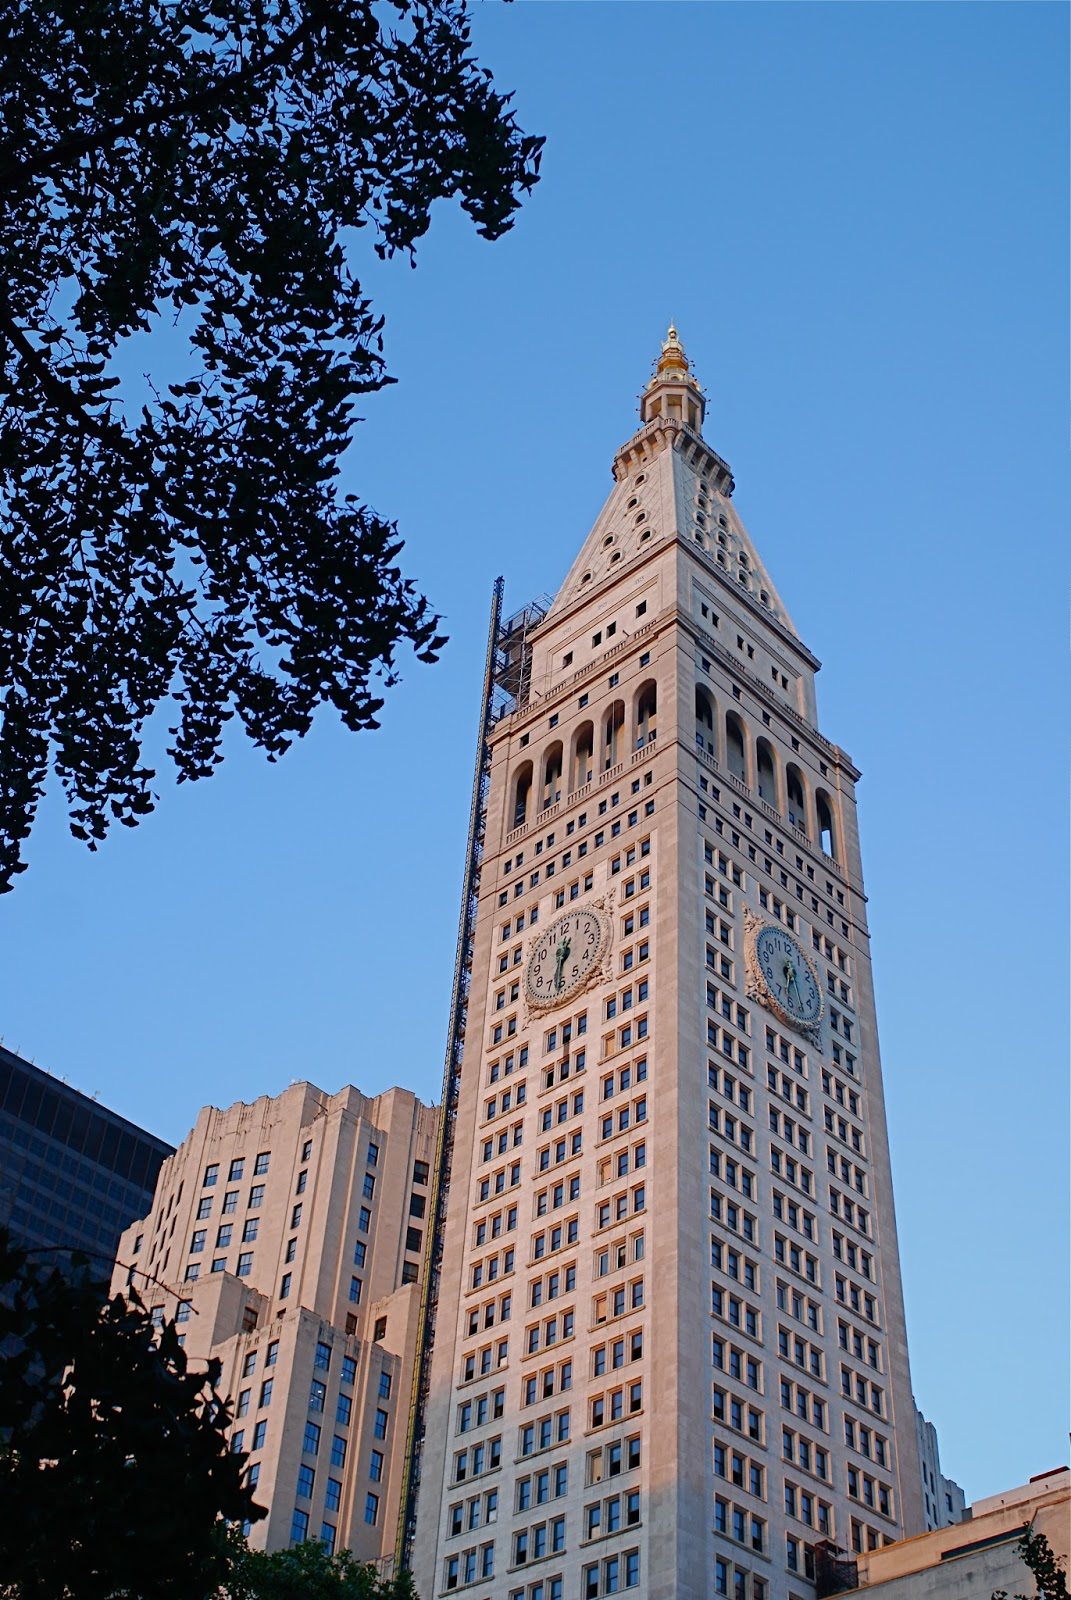 Metlife Life Insurance >> NYC ♥ NYC: The Metropolitan Life Insurance (MetLife) Tower and its Playful Sculptural ...